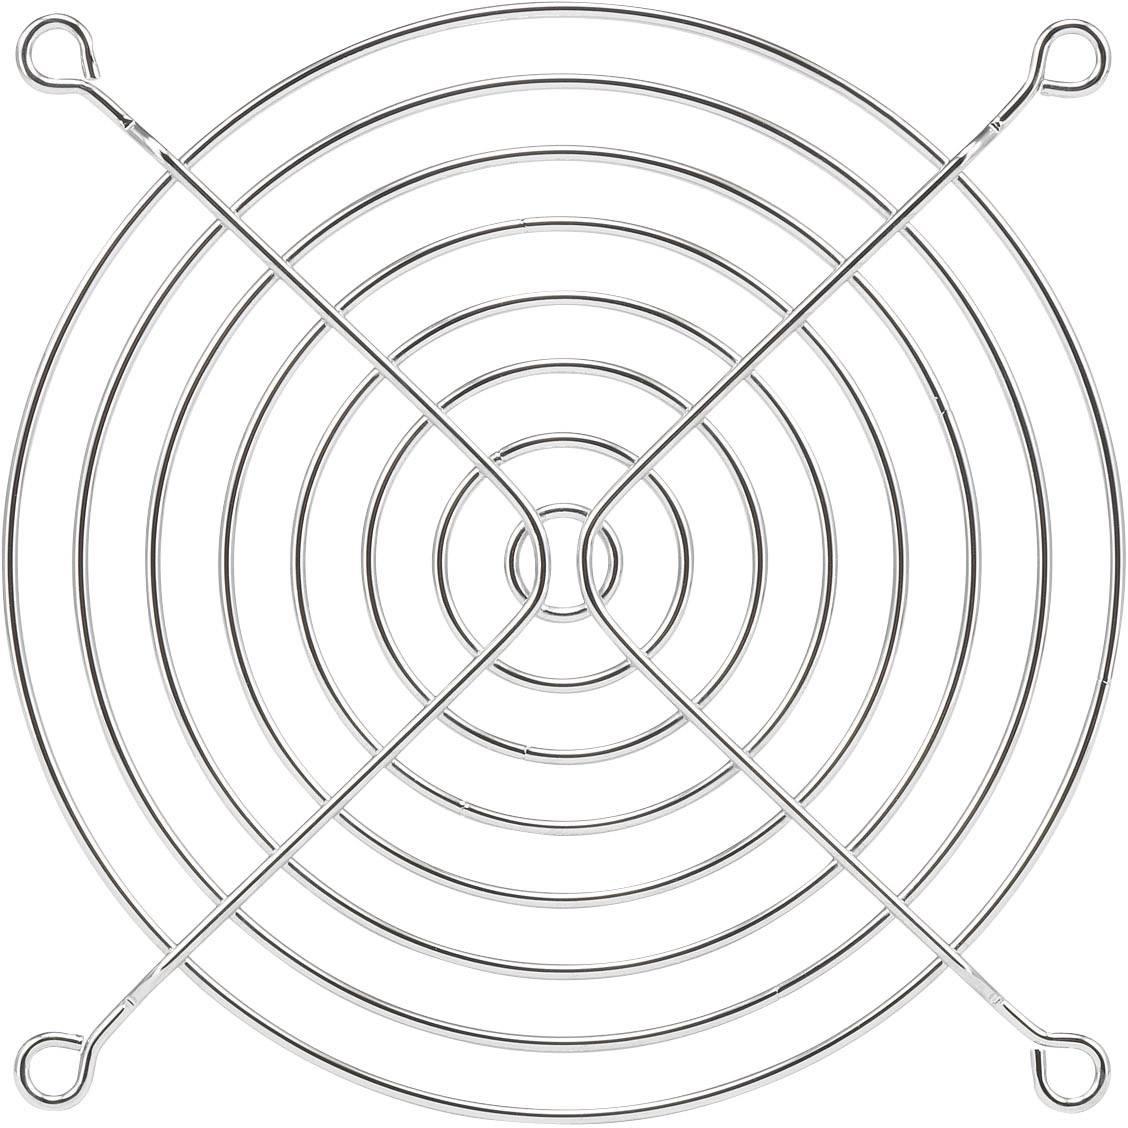 Vetracia mriežka PROFAN Technology 1408557, (š x v) 120 mm x 120 mm, kov, 1 ks